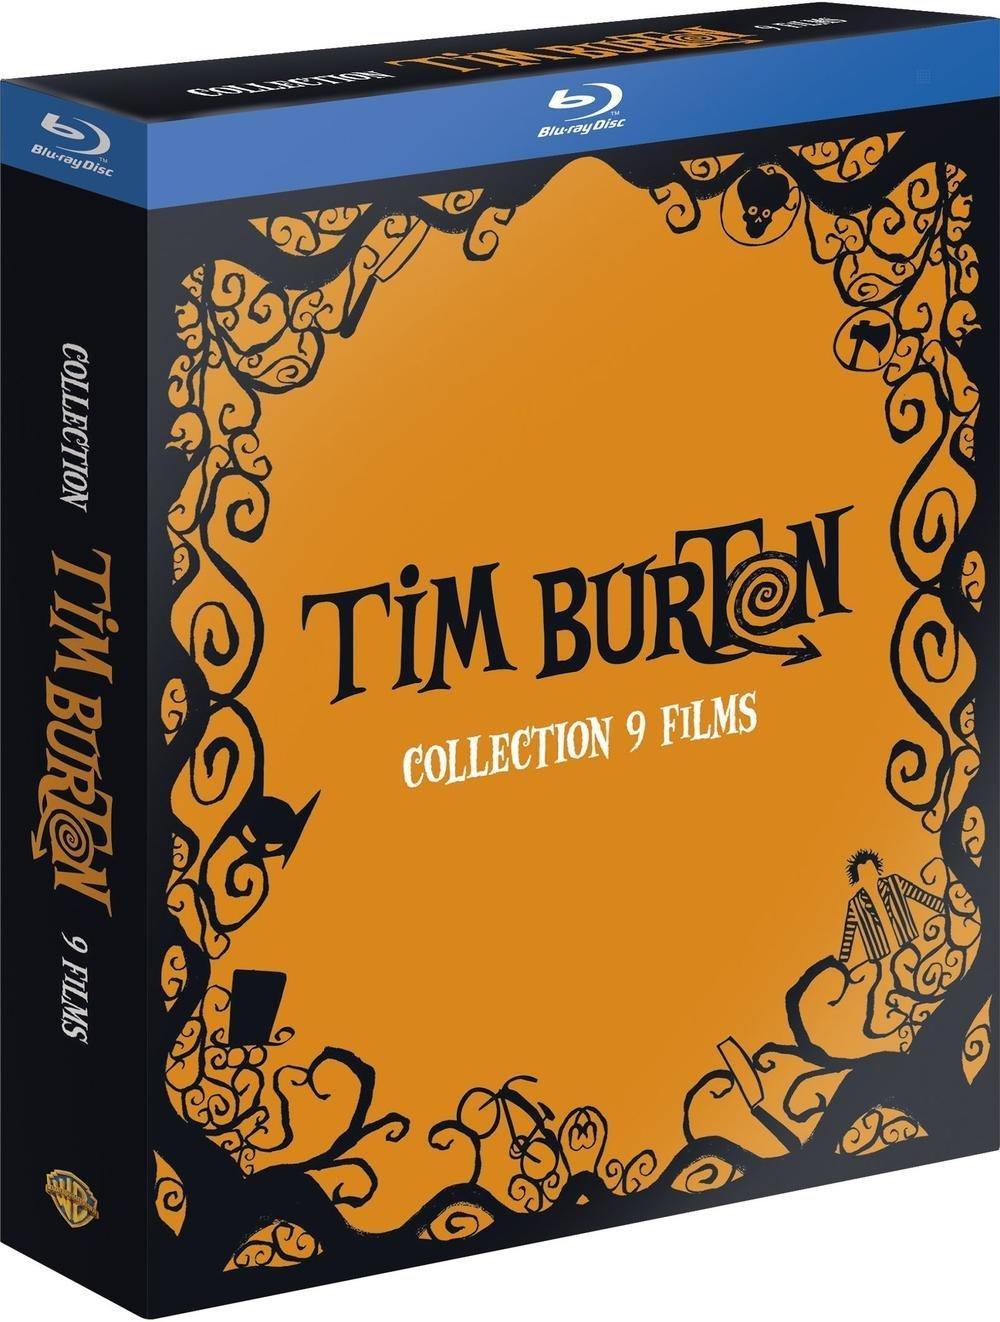 Coffret Blu-ray Tim Burton (9 films)